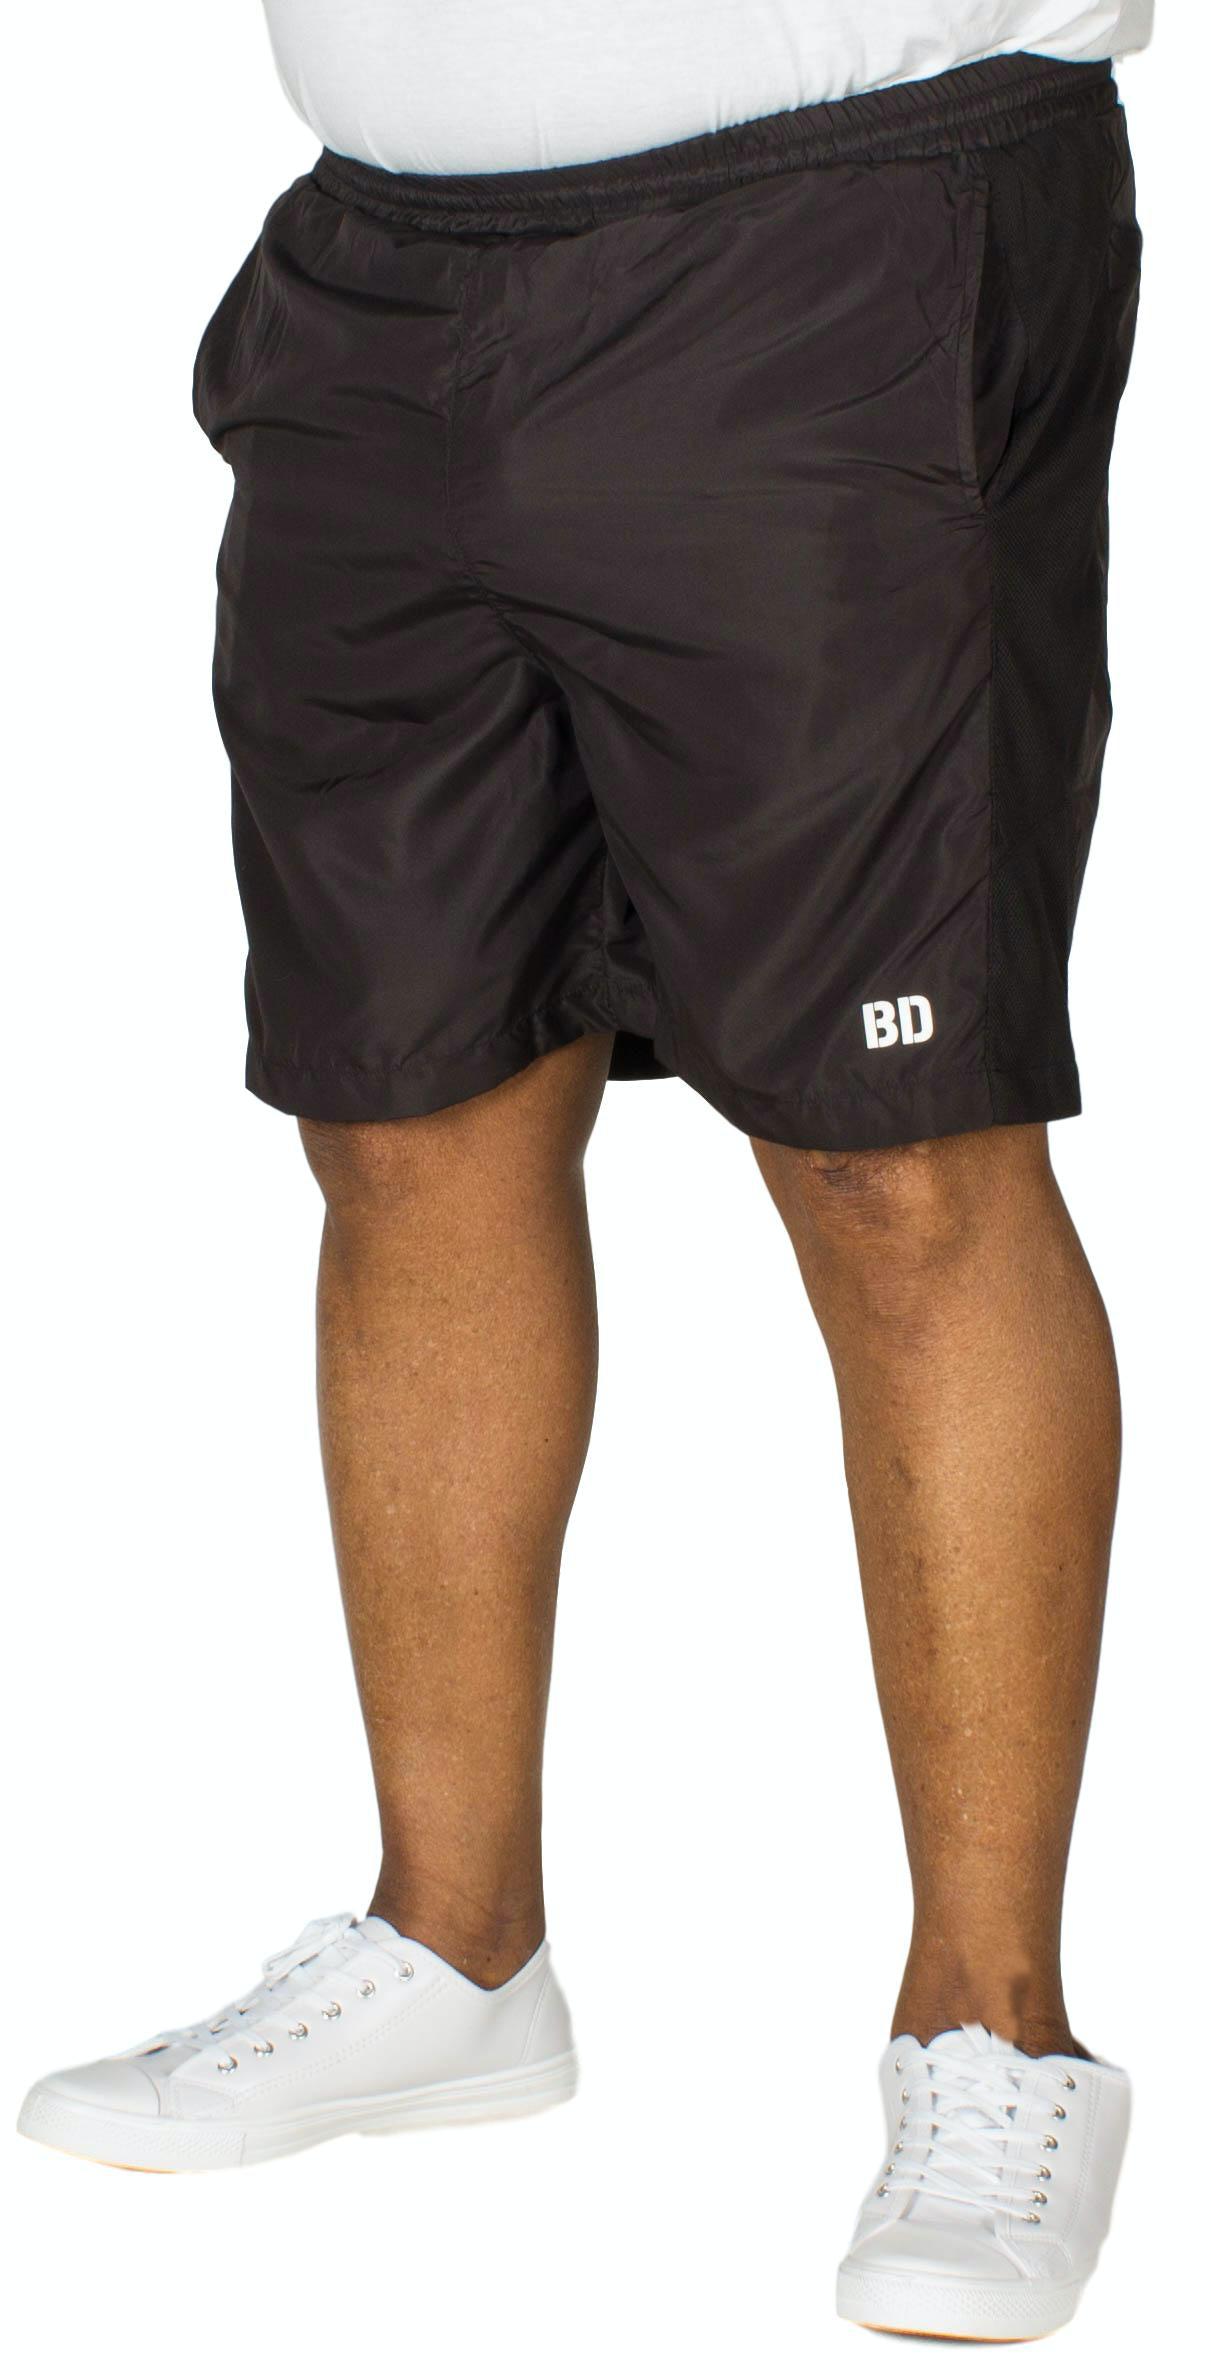 Bigdude Mesh Panel Gym Shorts Black